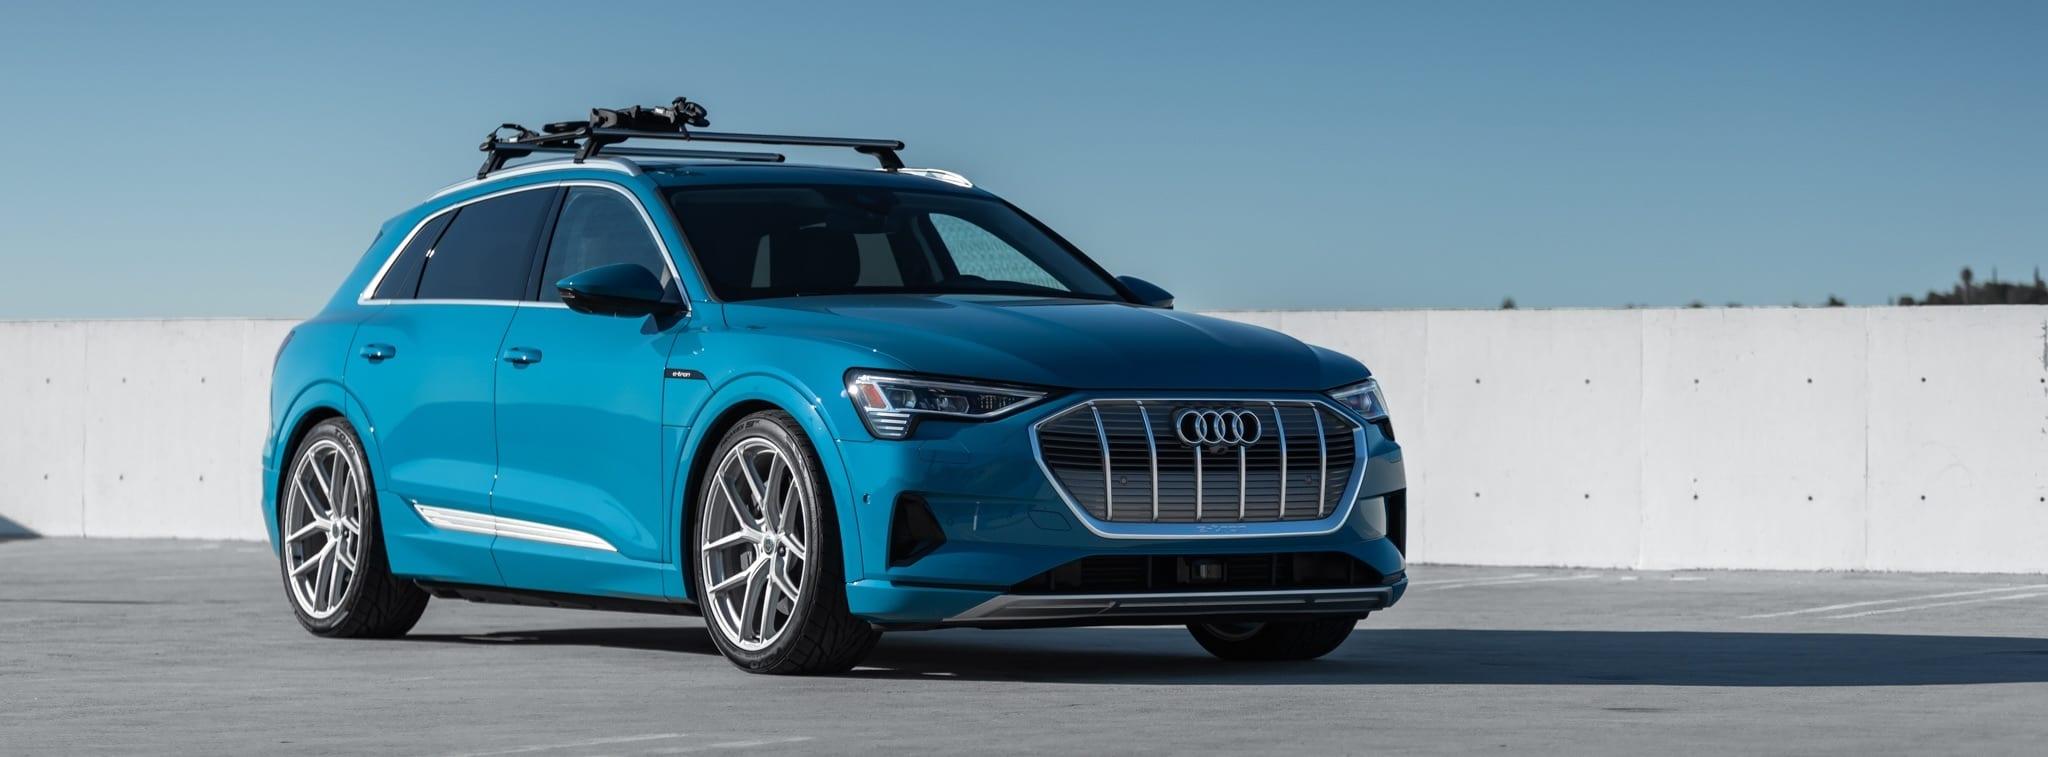 Antigua Blue Audi e-tron with HRE P101SC Wheels in Frozen Stone Clear